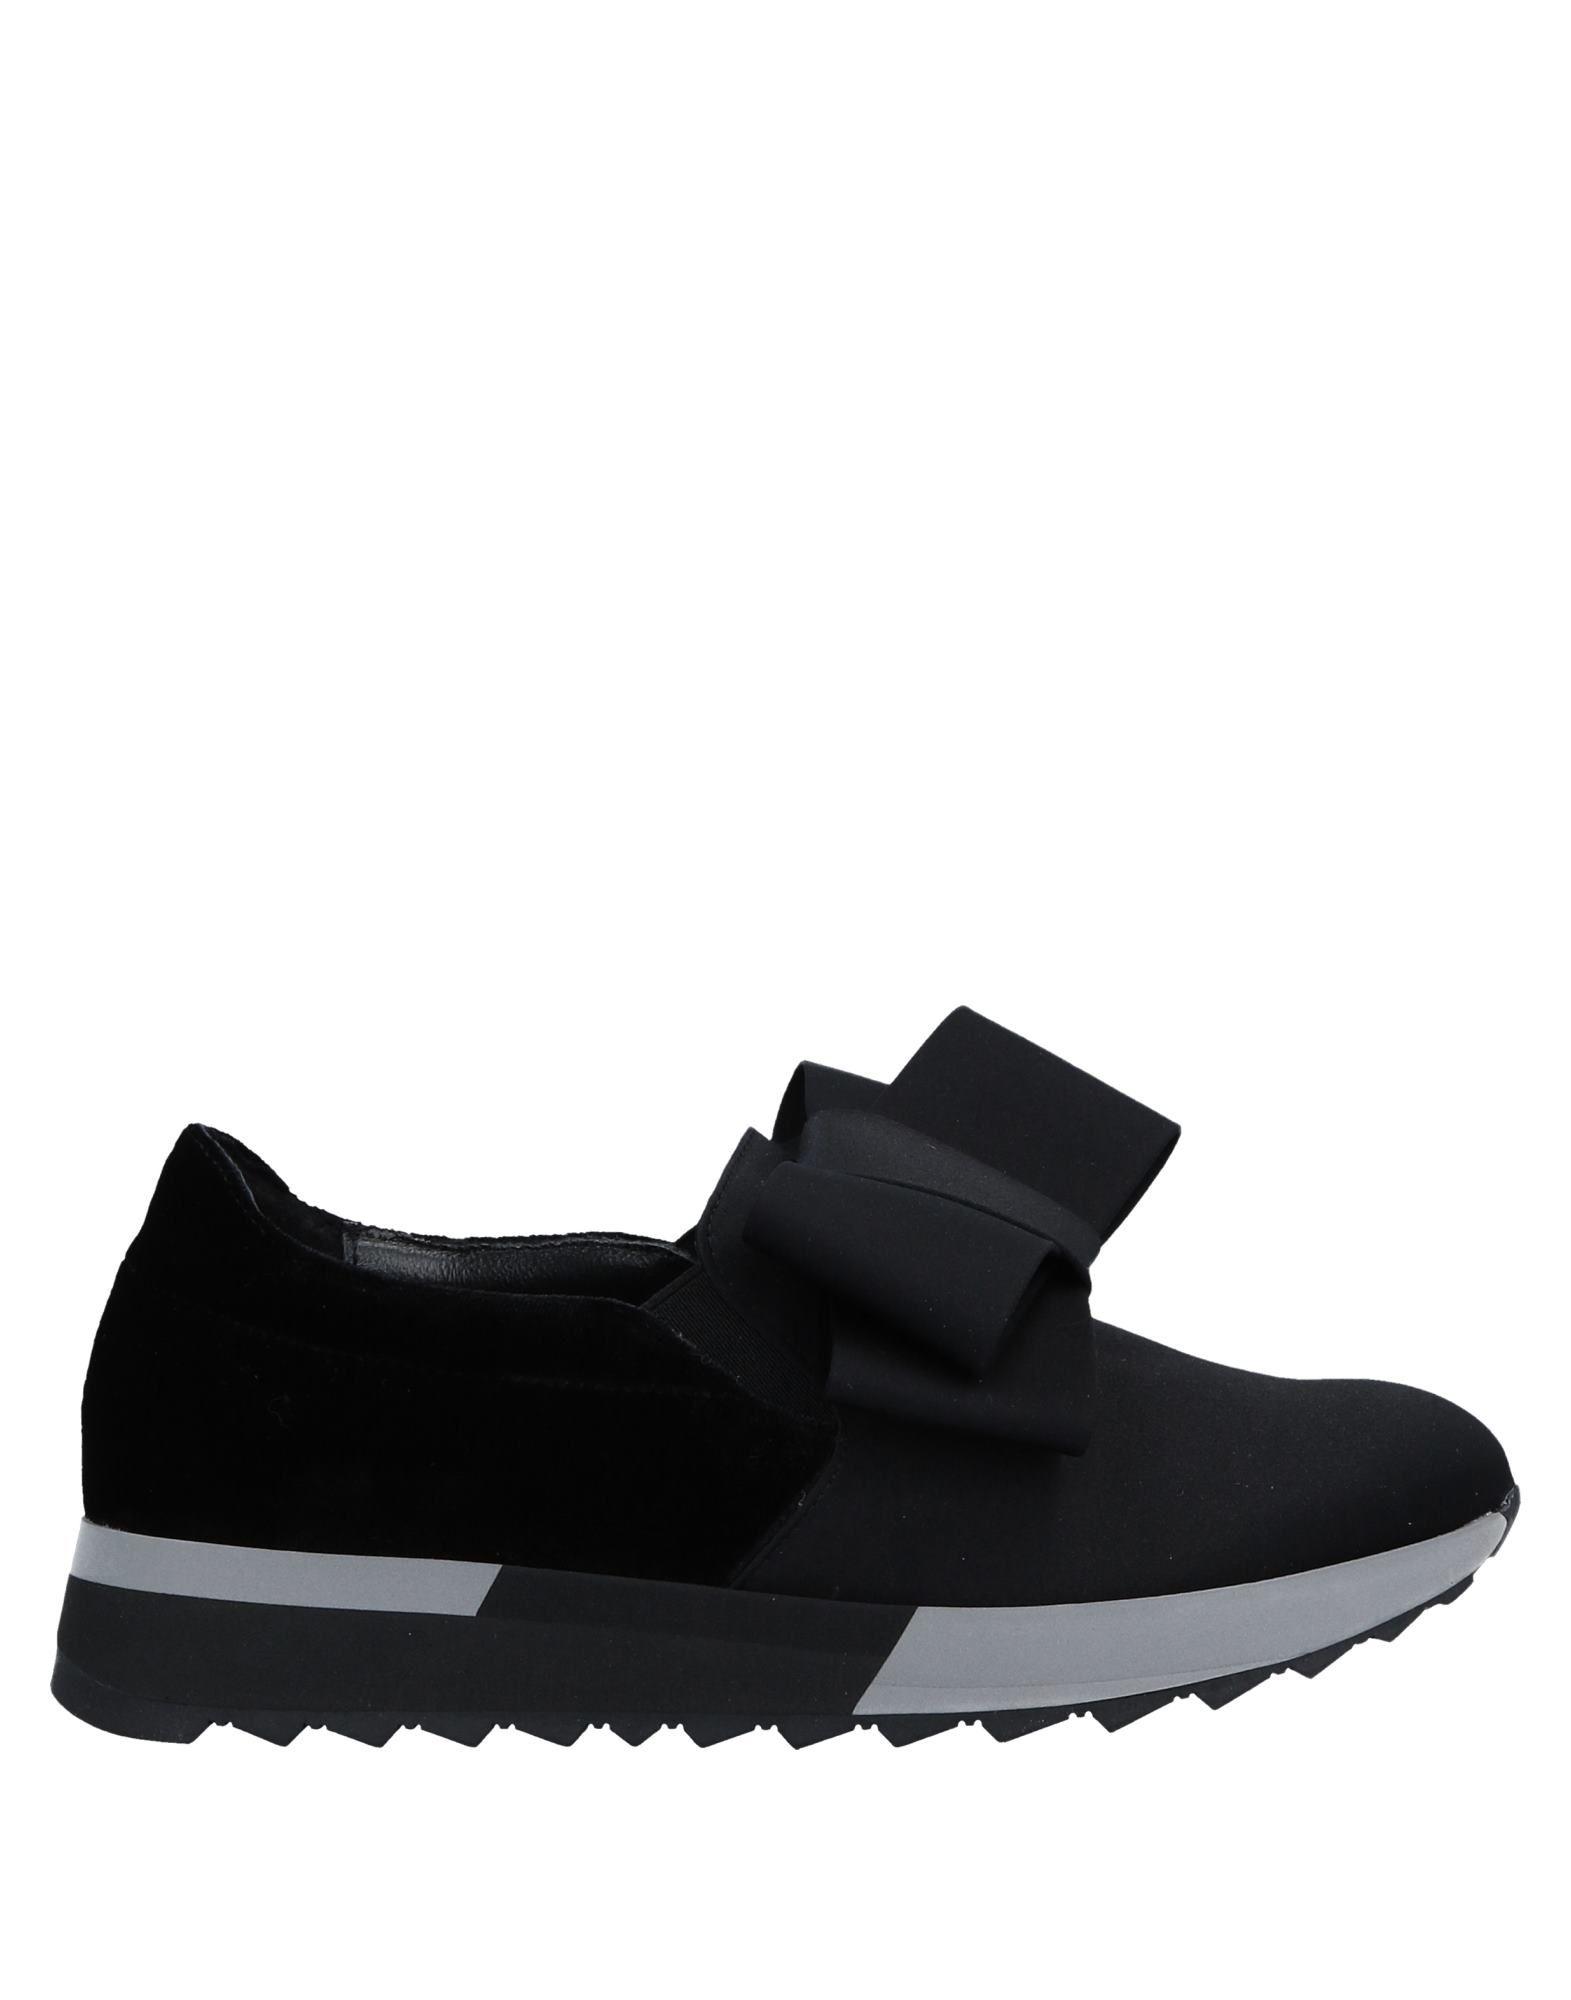 Sneakers Angela George Donna - 11533975GA